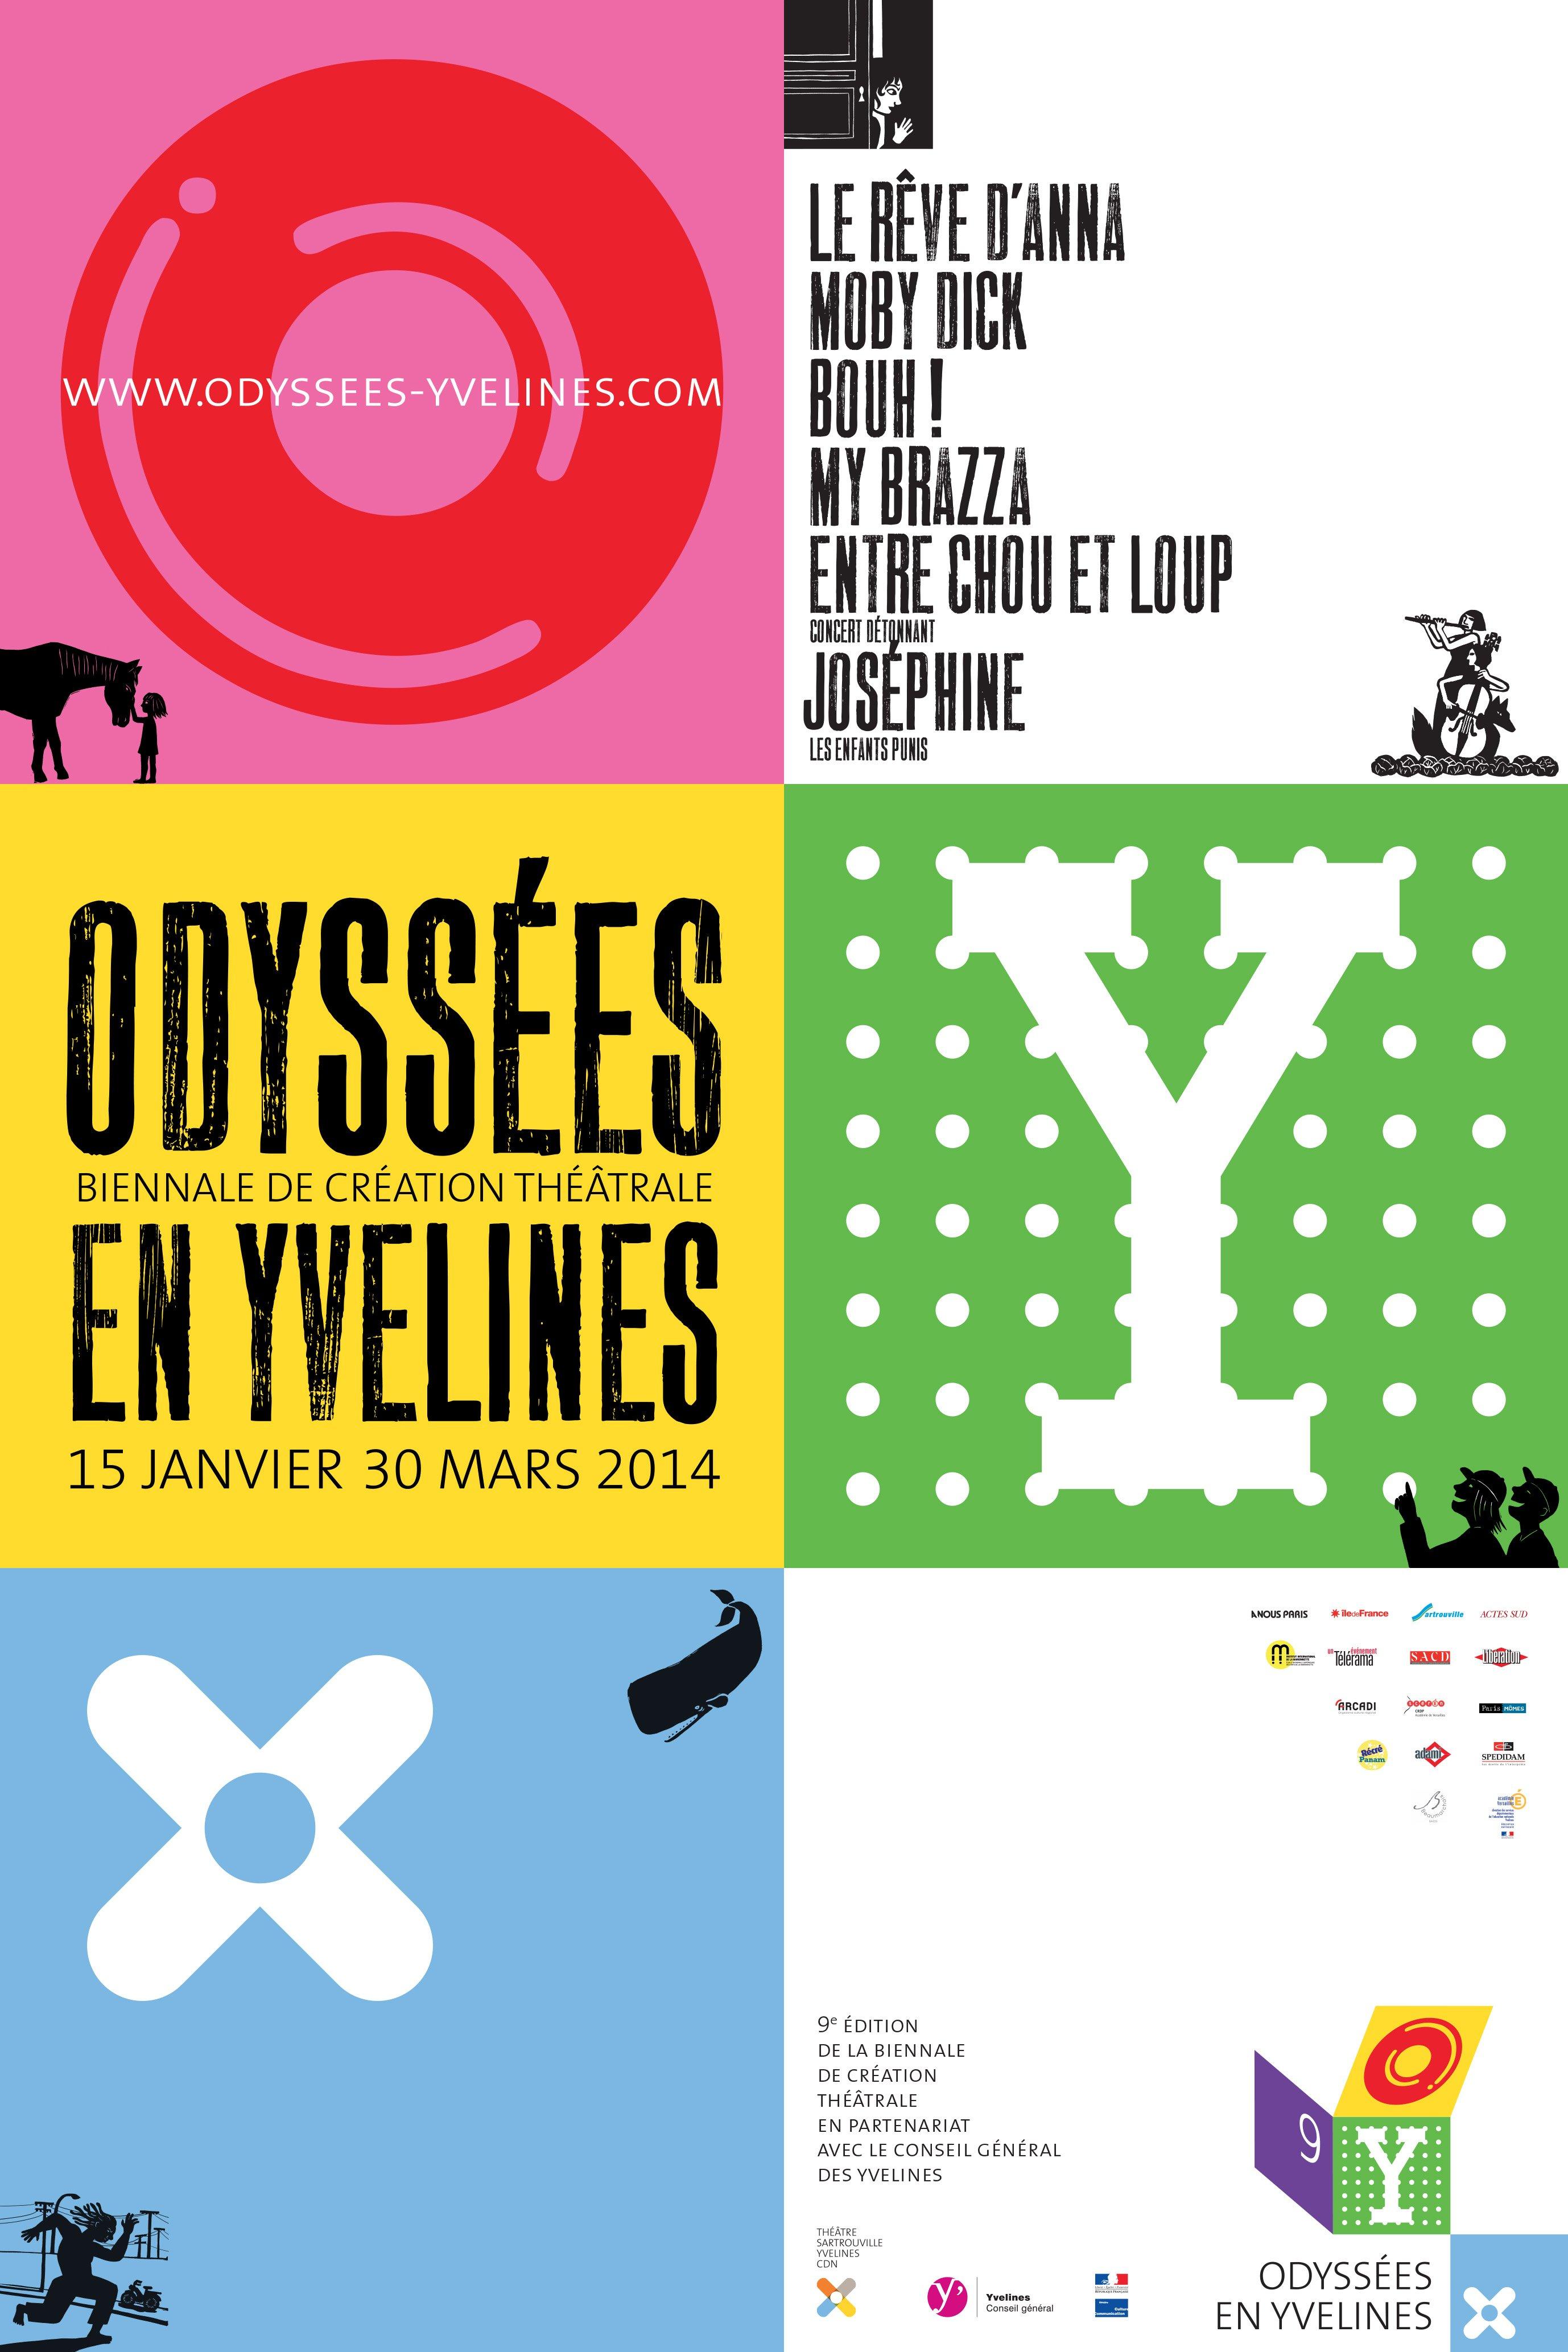 Odyssées en Yvelines